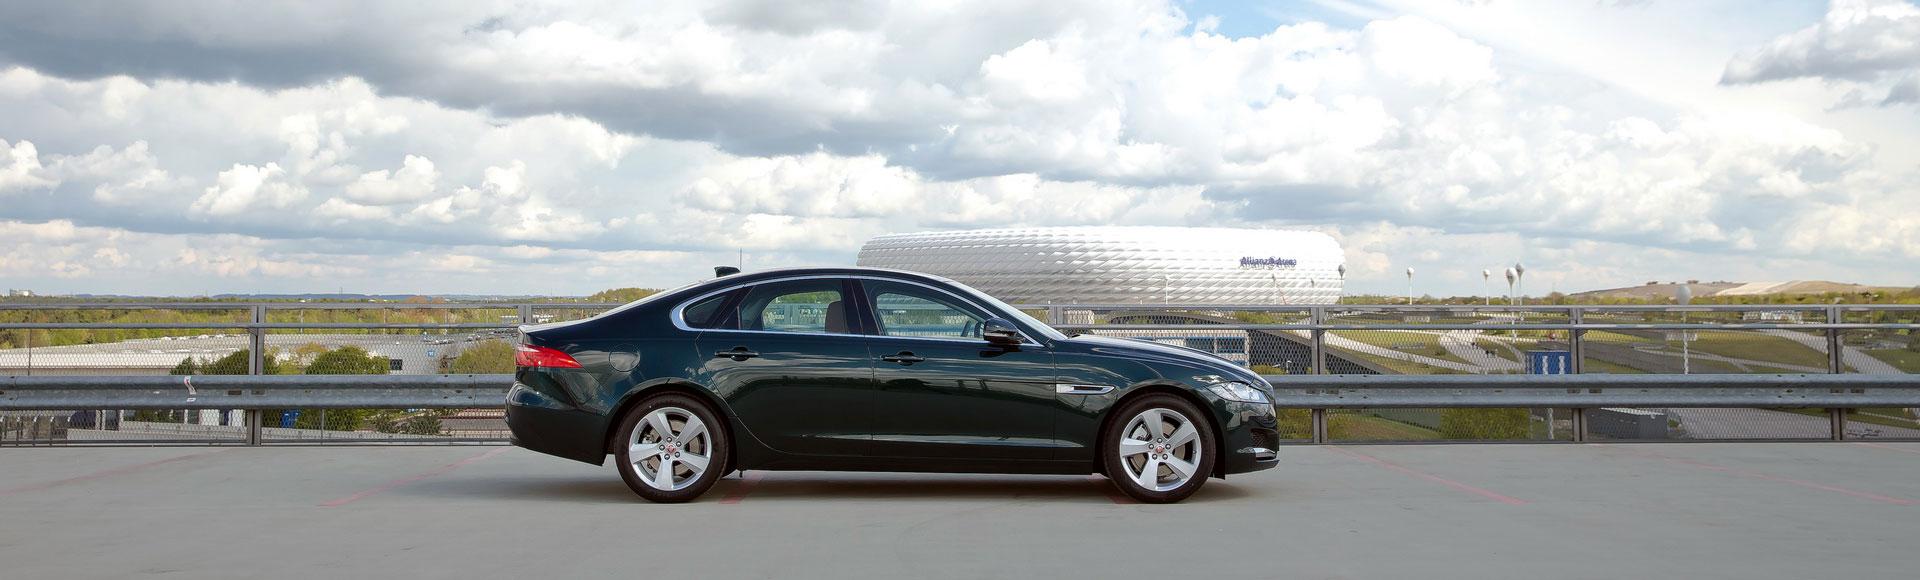 Jaguar XF 2016 187